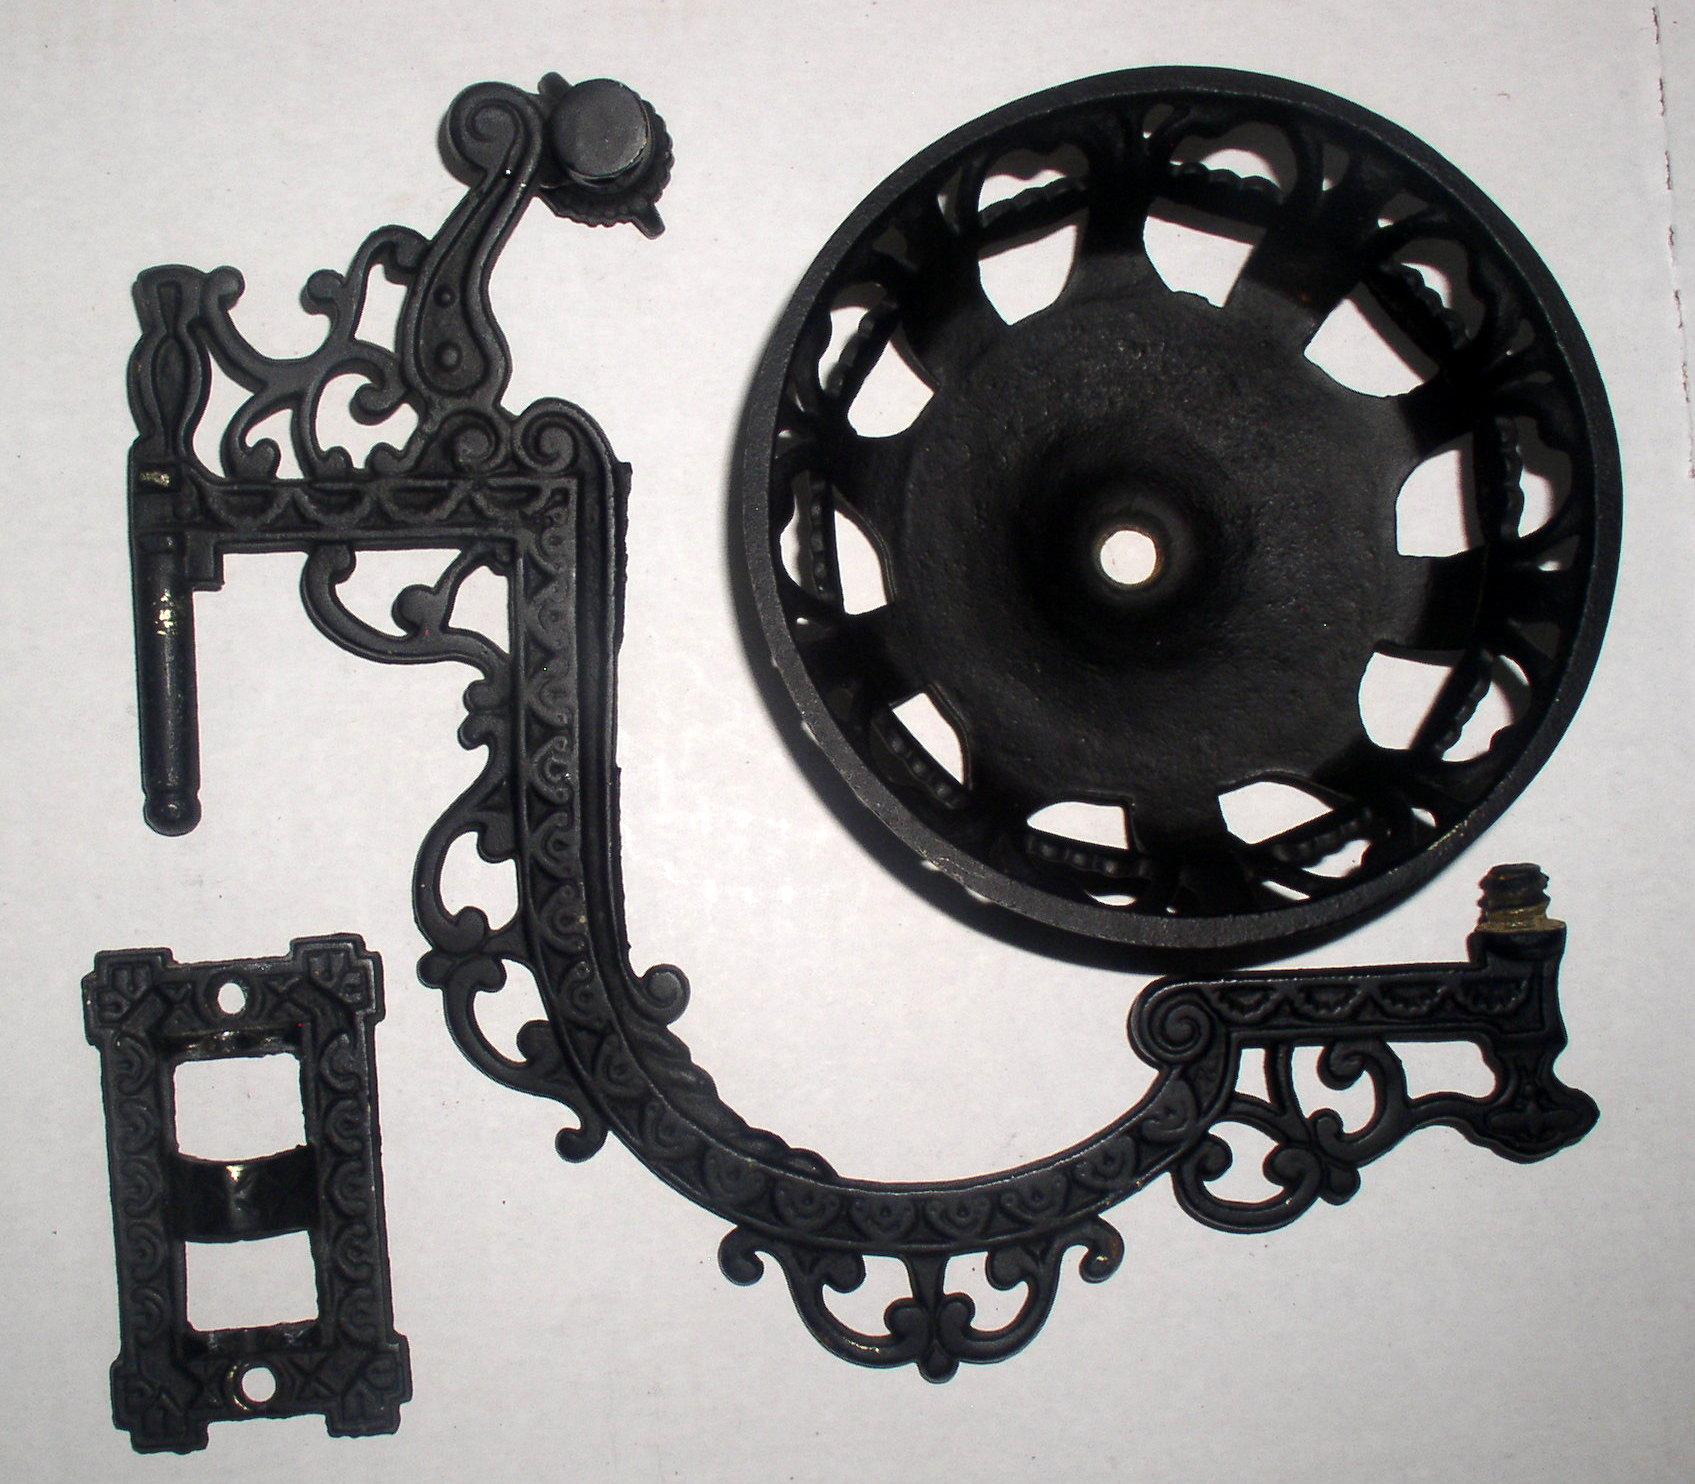 Wall Mount Lamp Holder : Antique Cast Iron Wall Mount Kerosene Oil Lamp Bracket Holder, Complete Thingery Previews ...